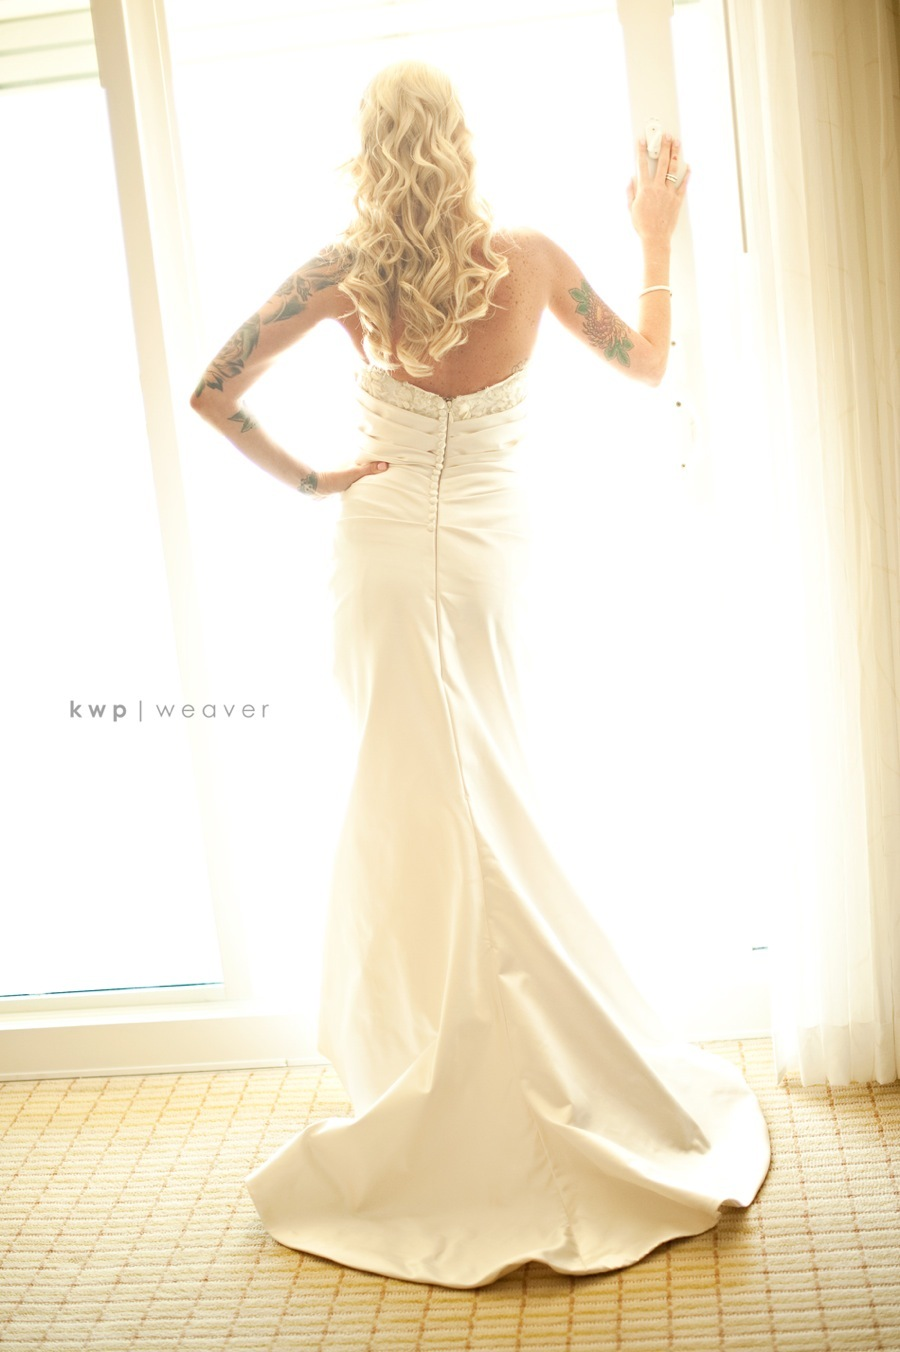 edgy bride wears ivory mermaid wedding dress, all-down